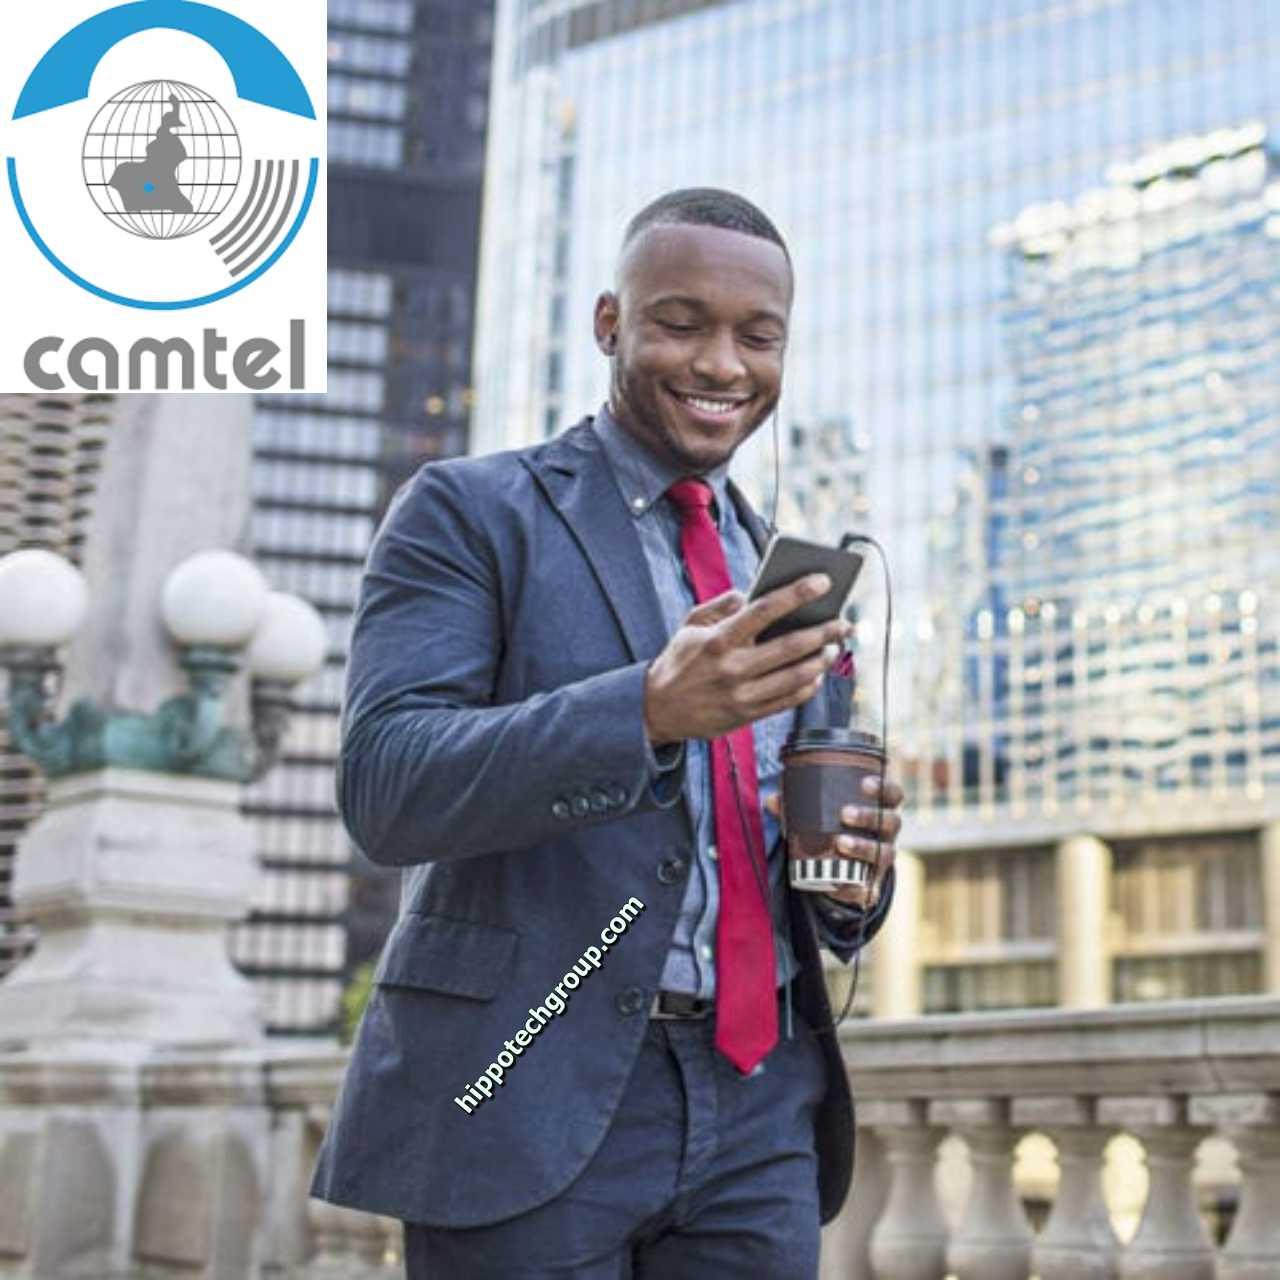 Camtel Cameroon Secret Internet Codes (USSD Codes)